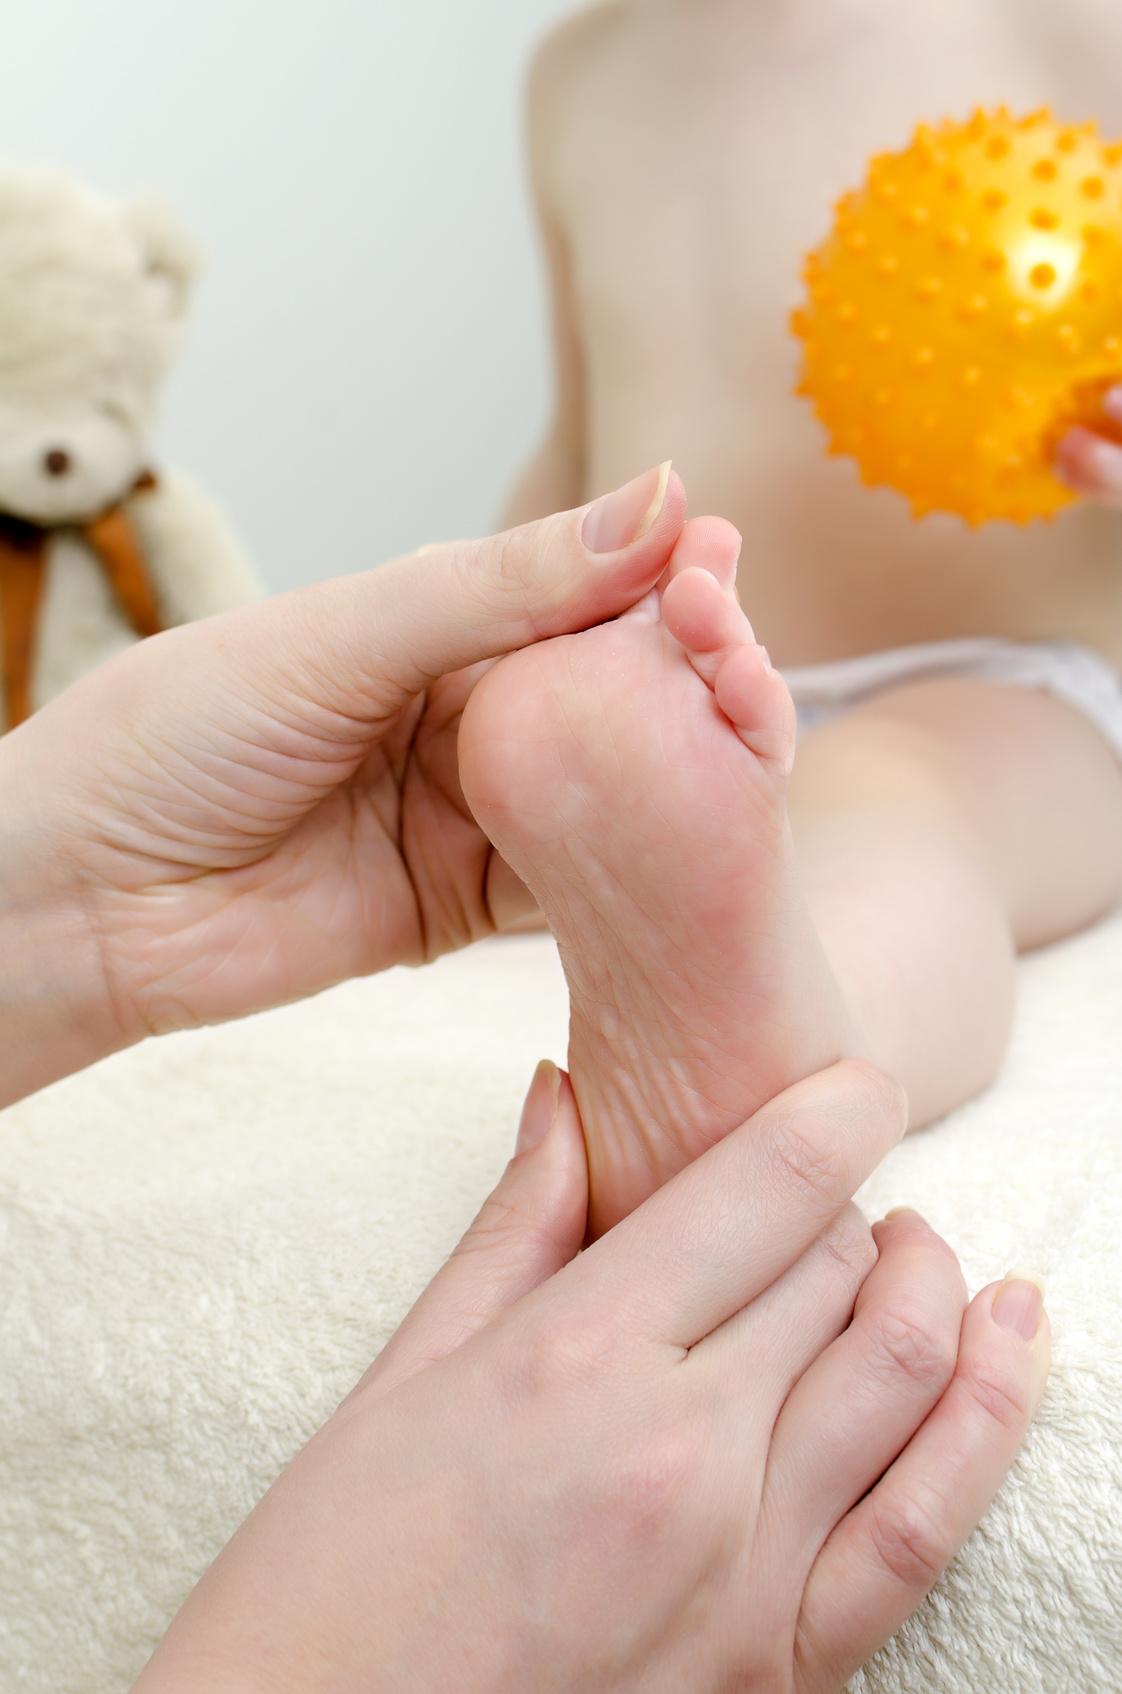 Fuß und Therapeut